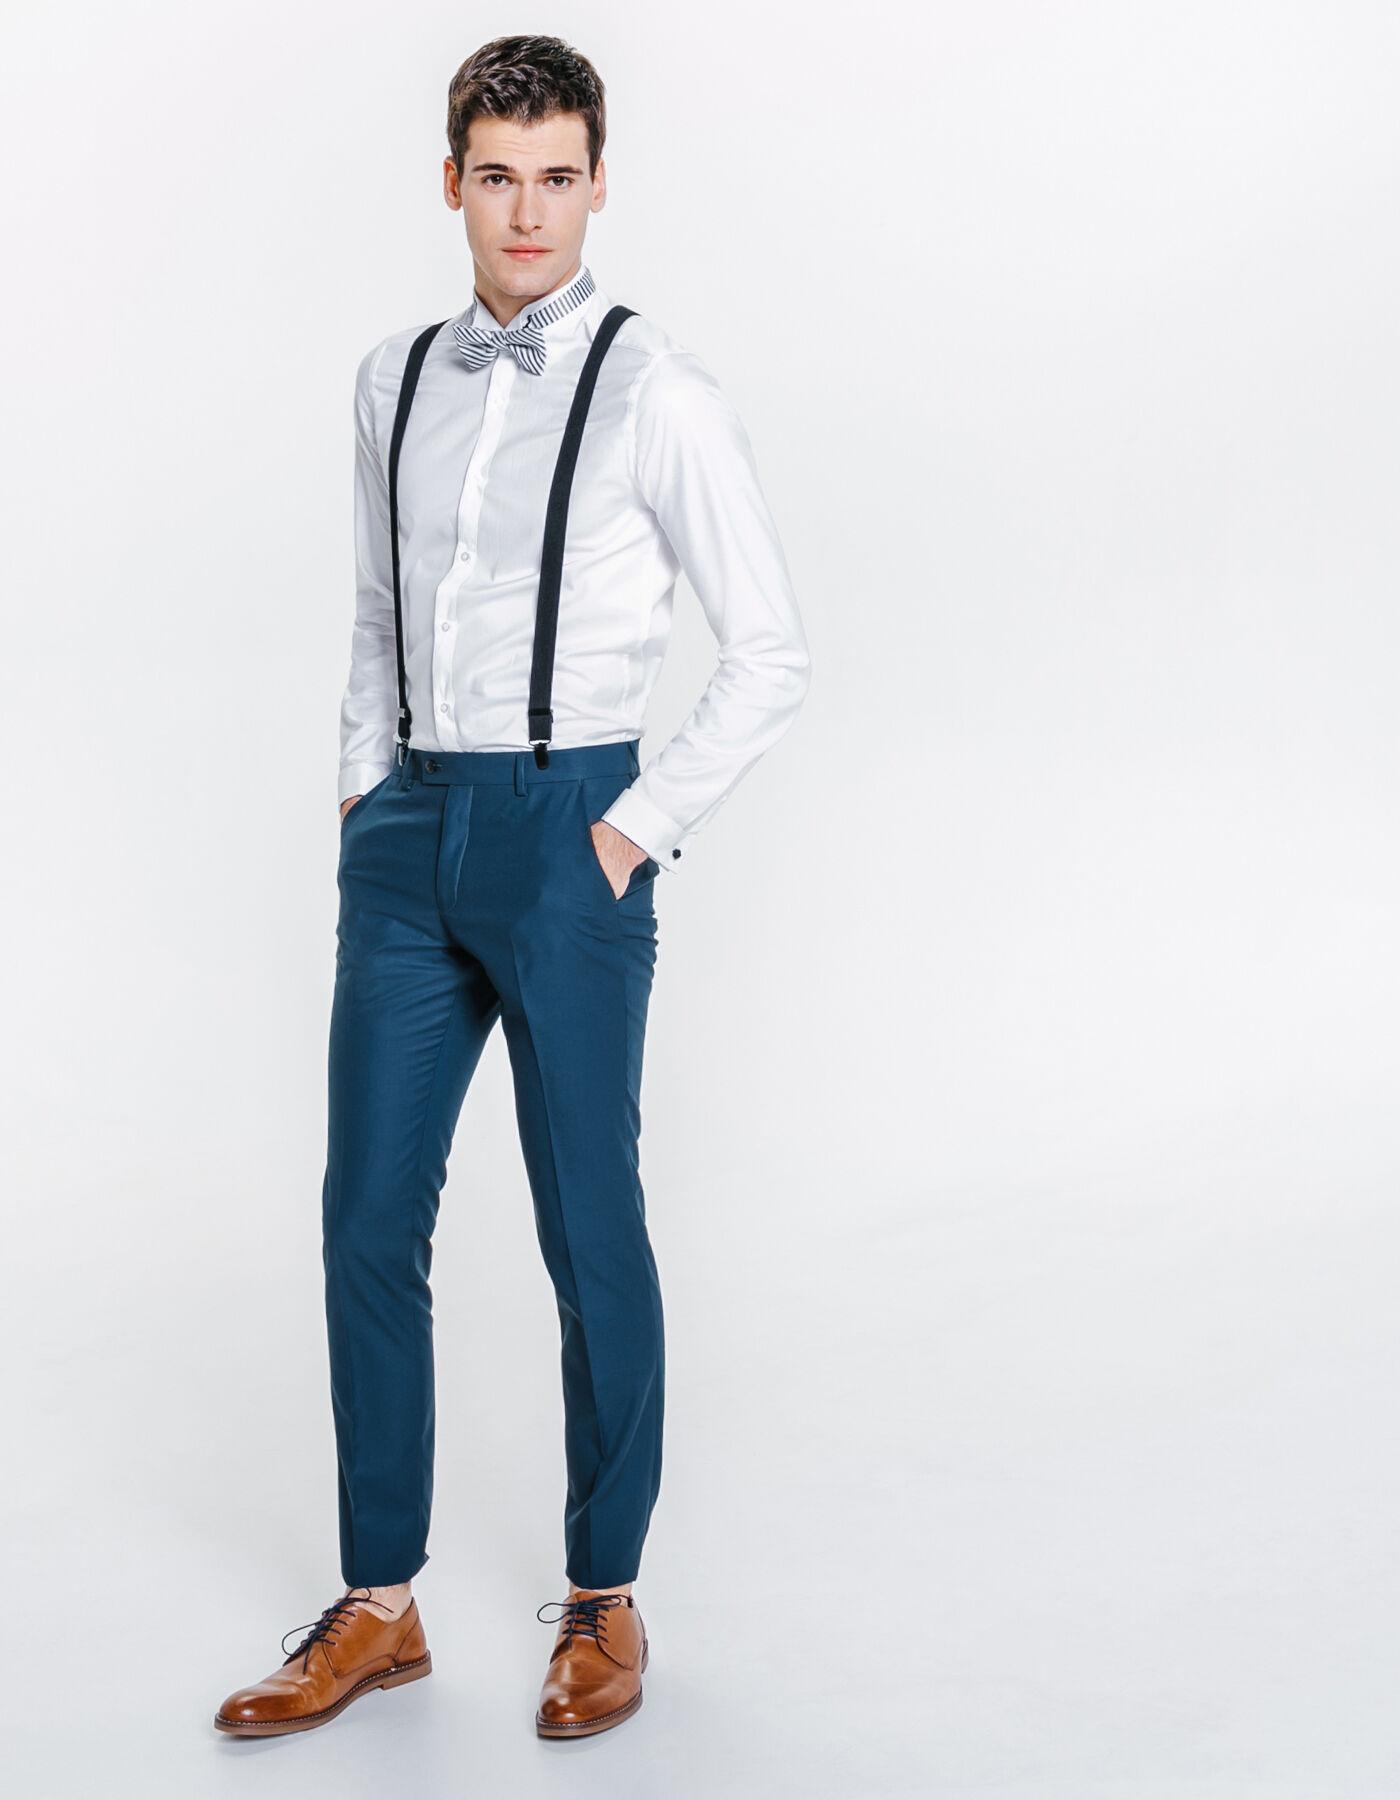 pantalon de costume slim premier prix bleu canard homme jules. Black Bedroom Furniture Sets. Home Design Ideas